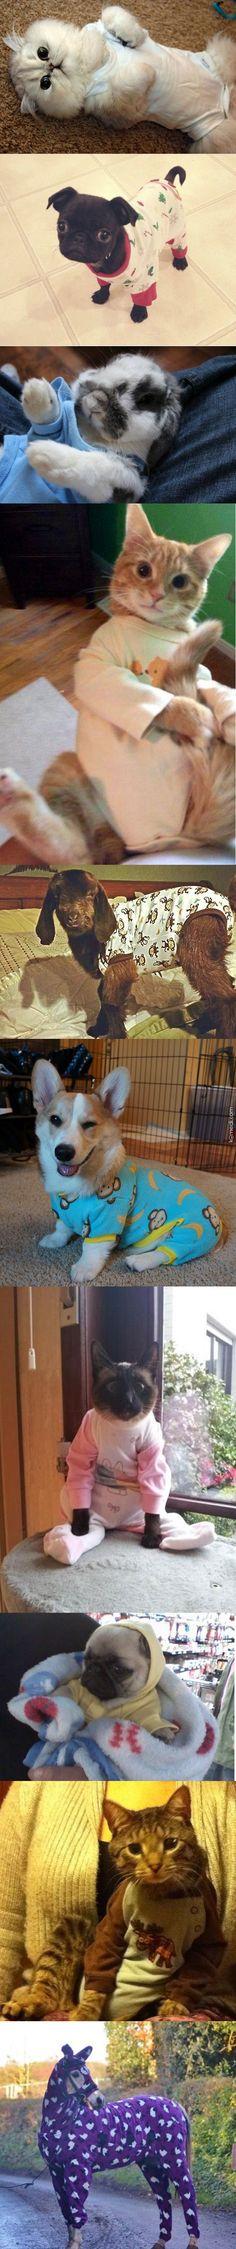 Pijamalı Yavru Hayvanlar